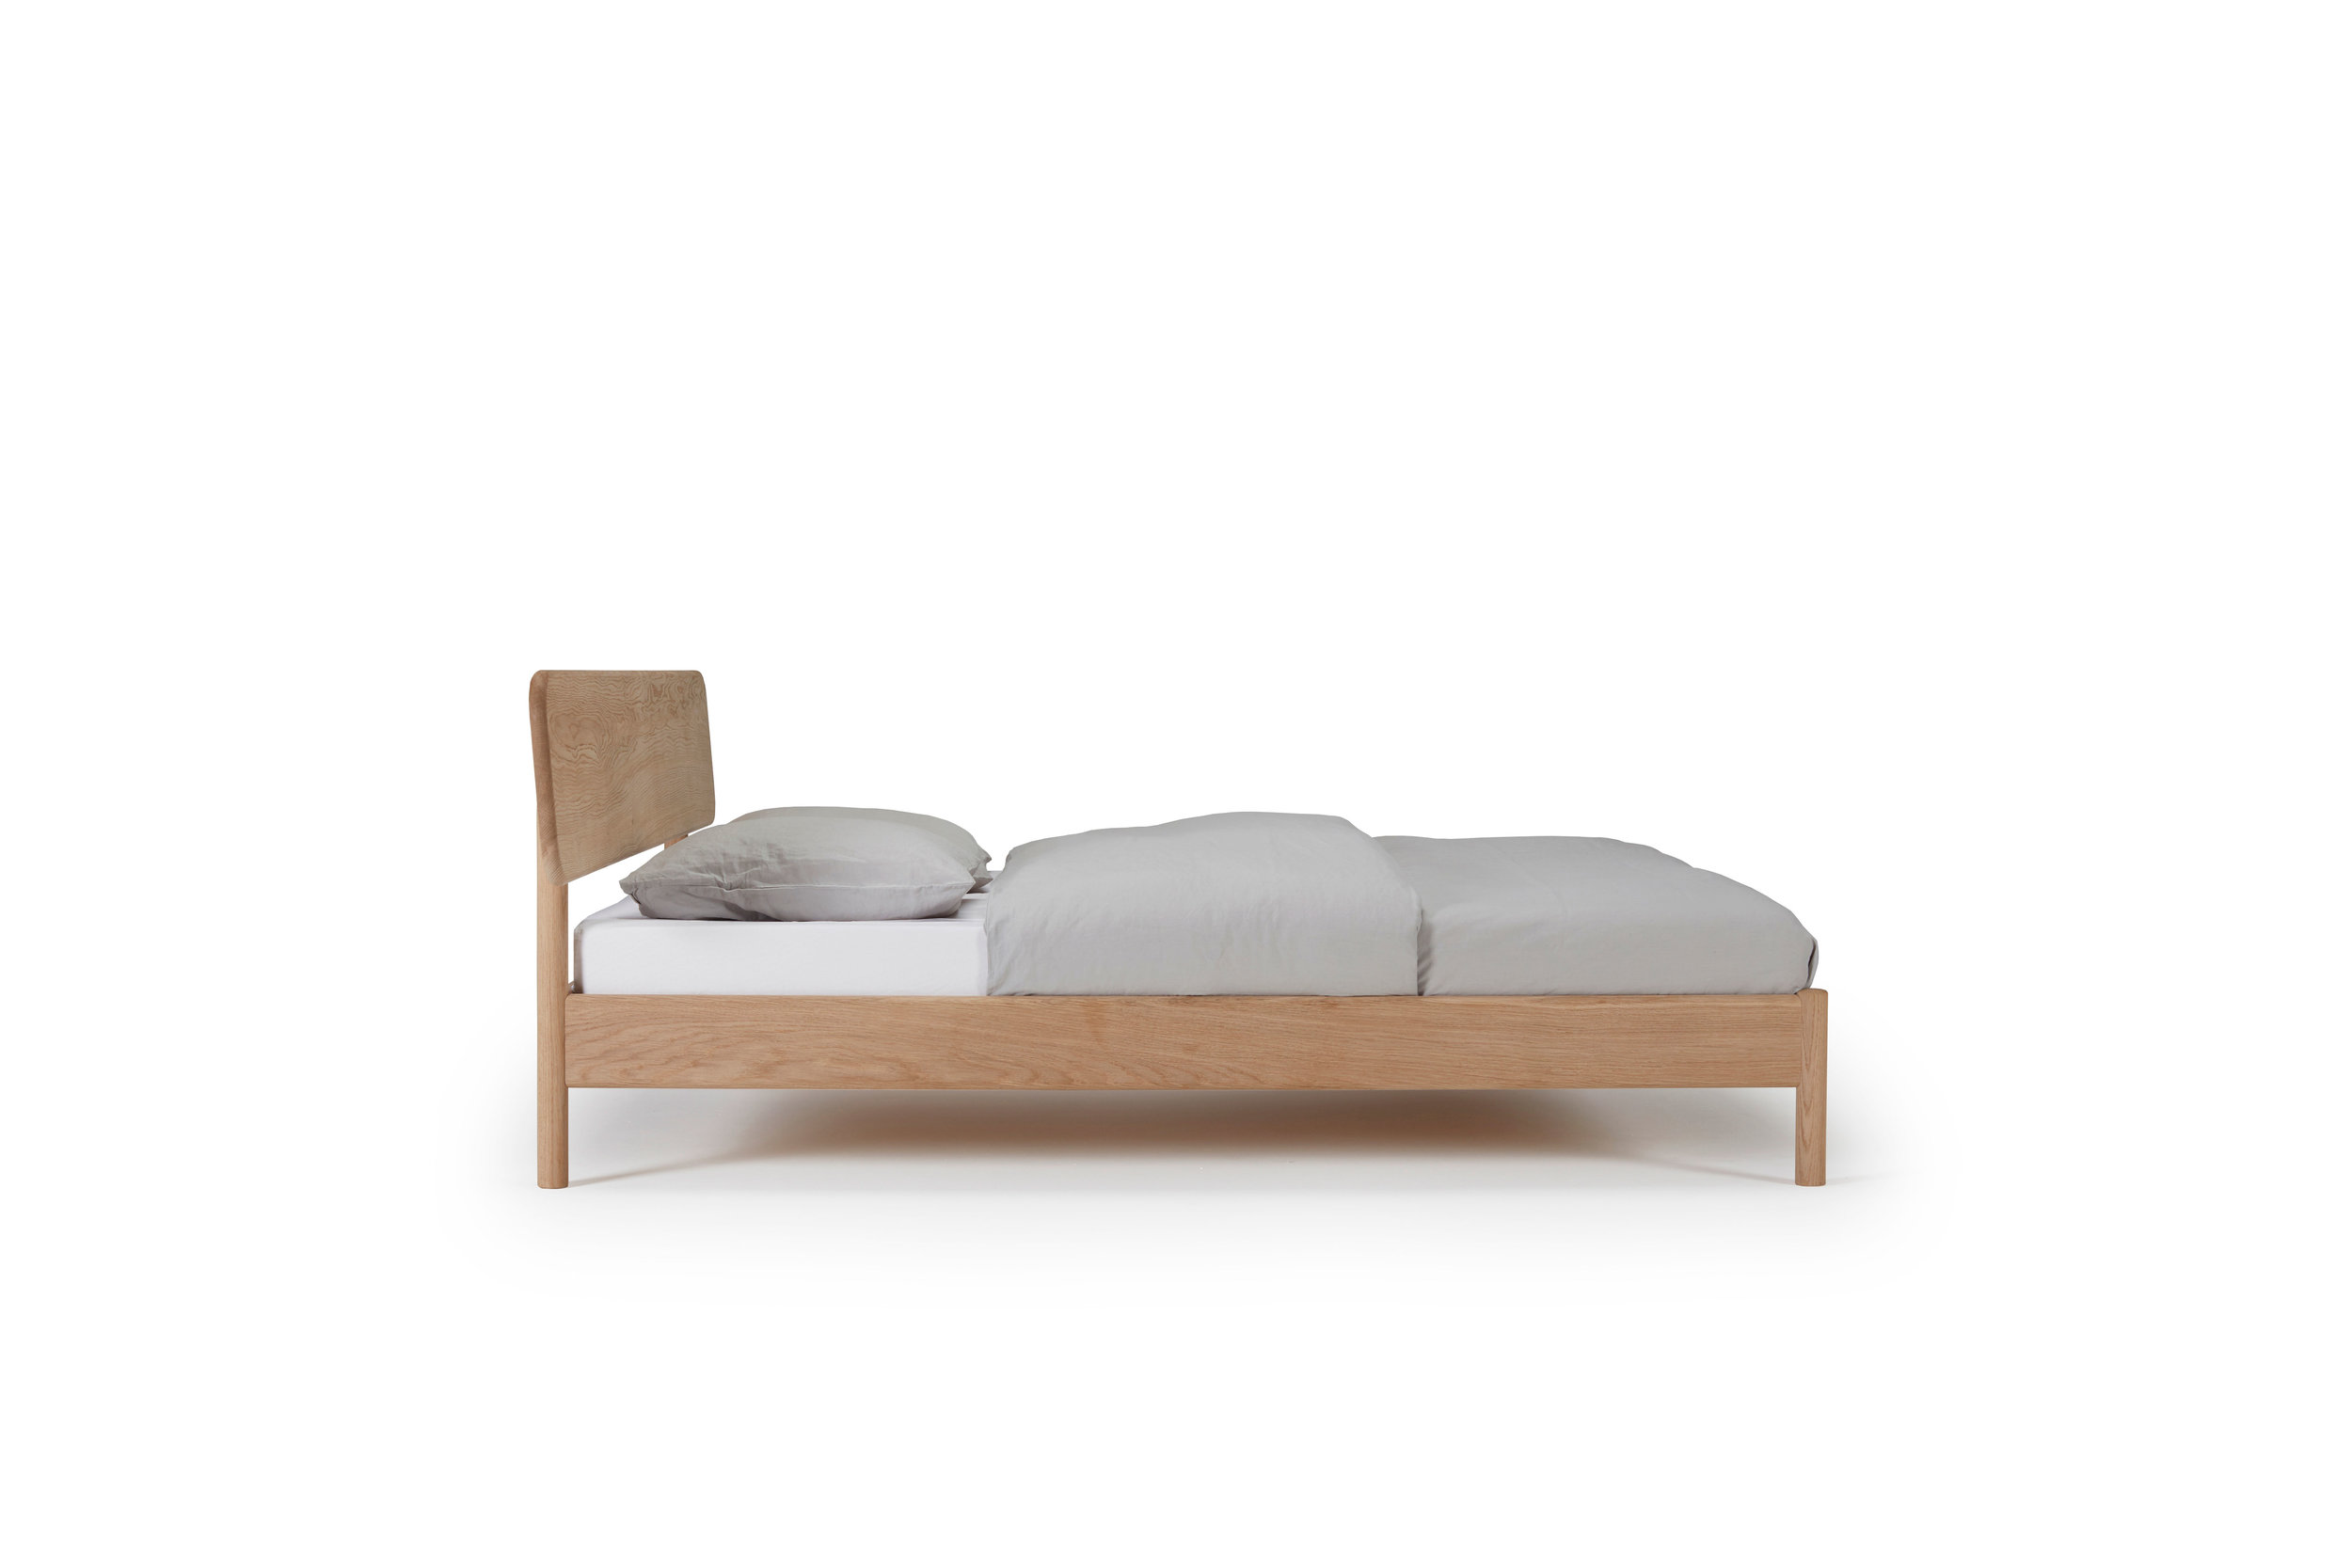 2---ALKEN-BED---RE-BEDS---DESIGN-BY-OLIVER-&-LUKAS-WEISSKROGH.jpg